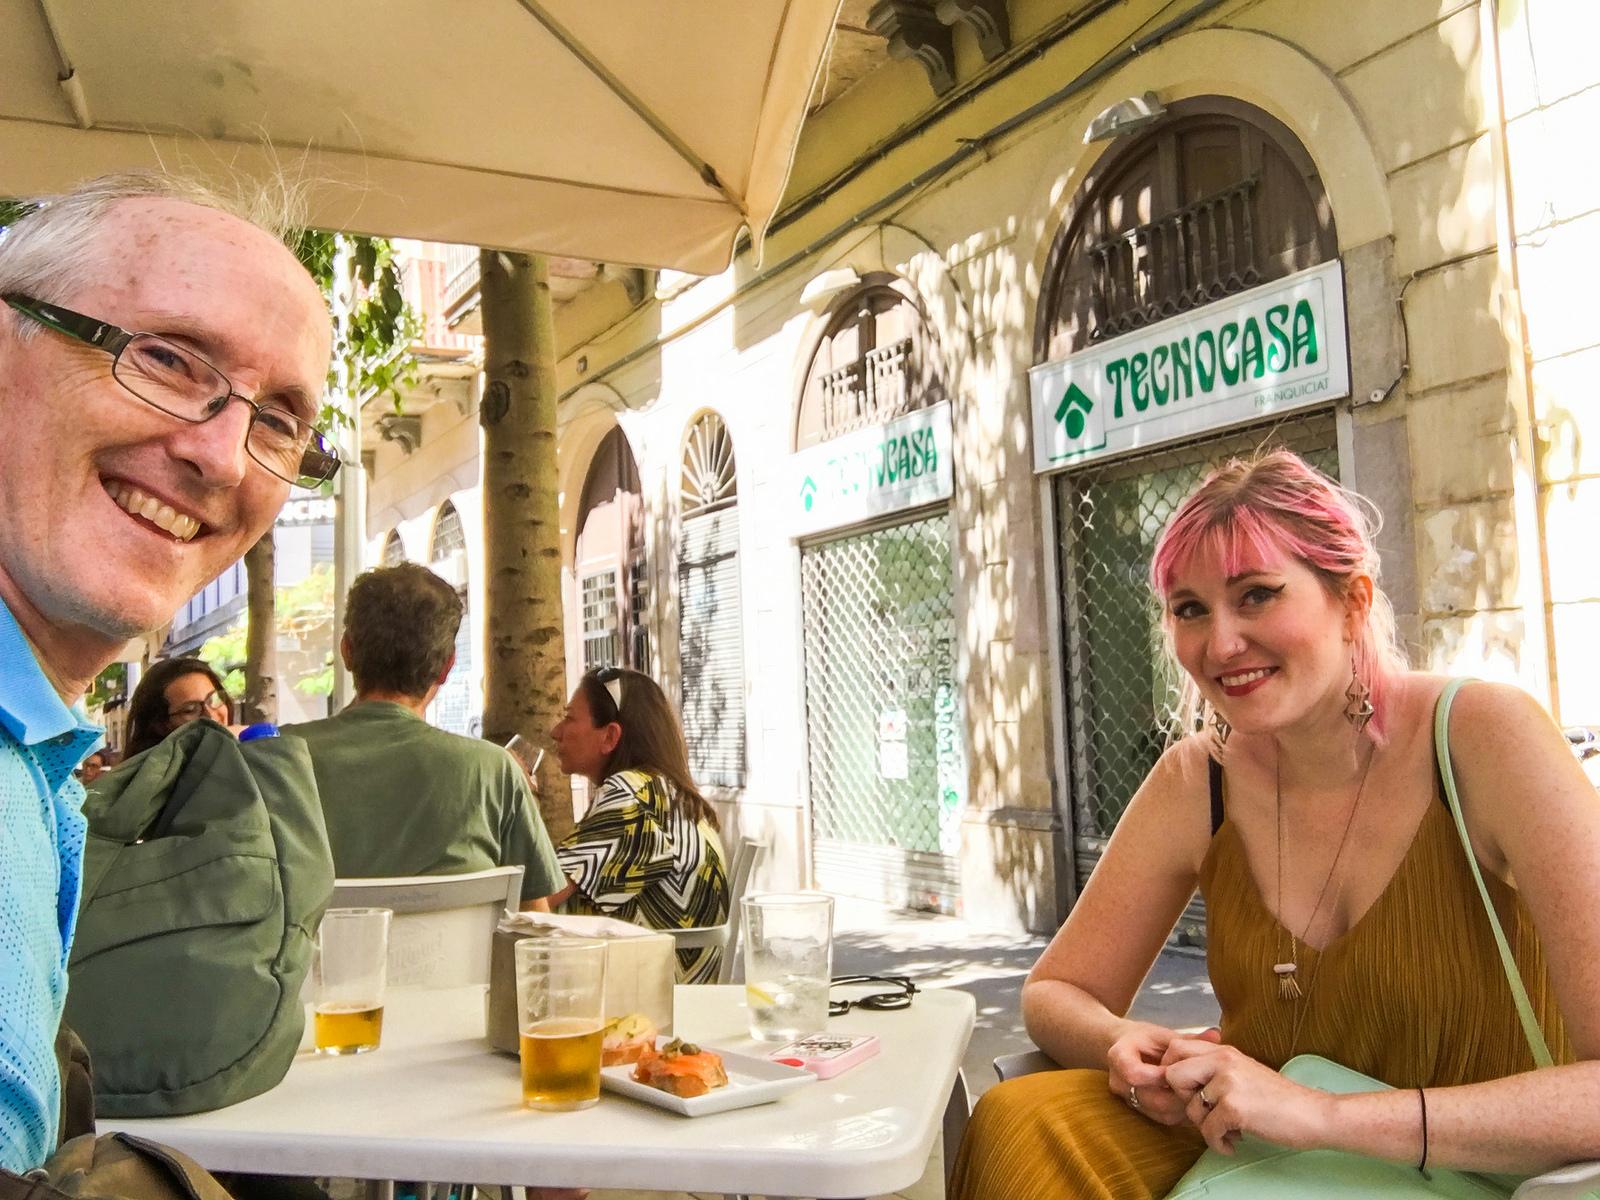 Barcelona's El Poble-sec Neighbourhood